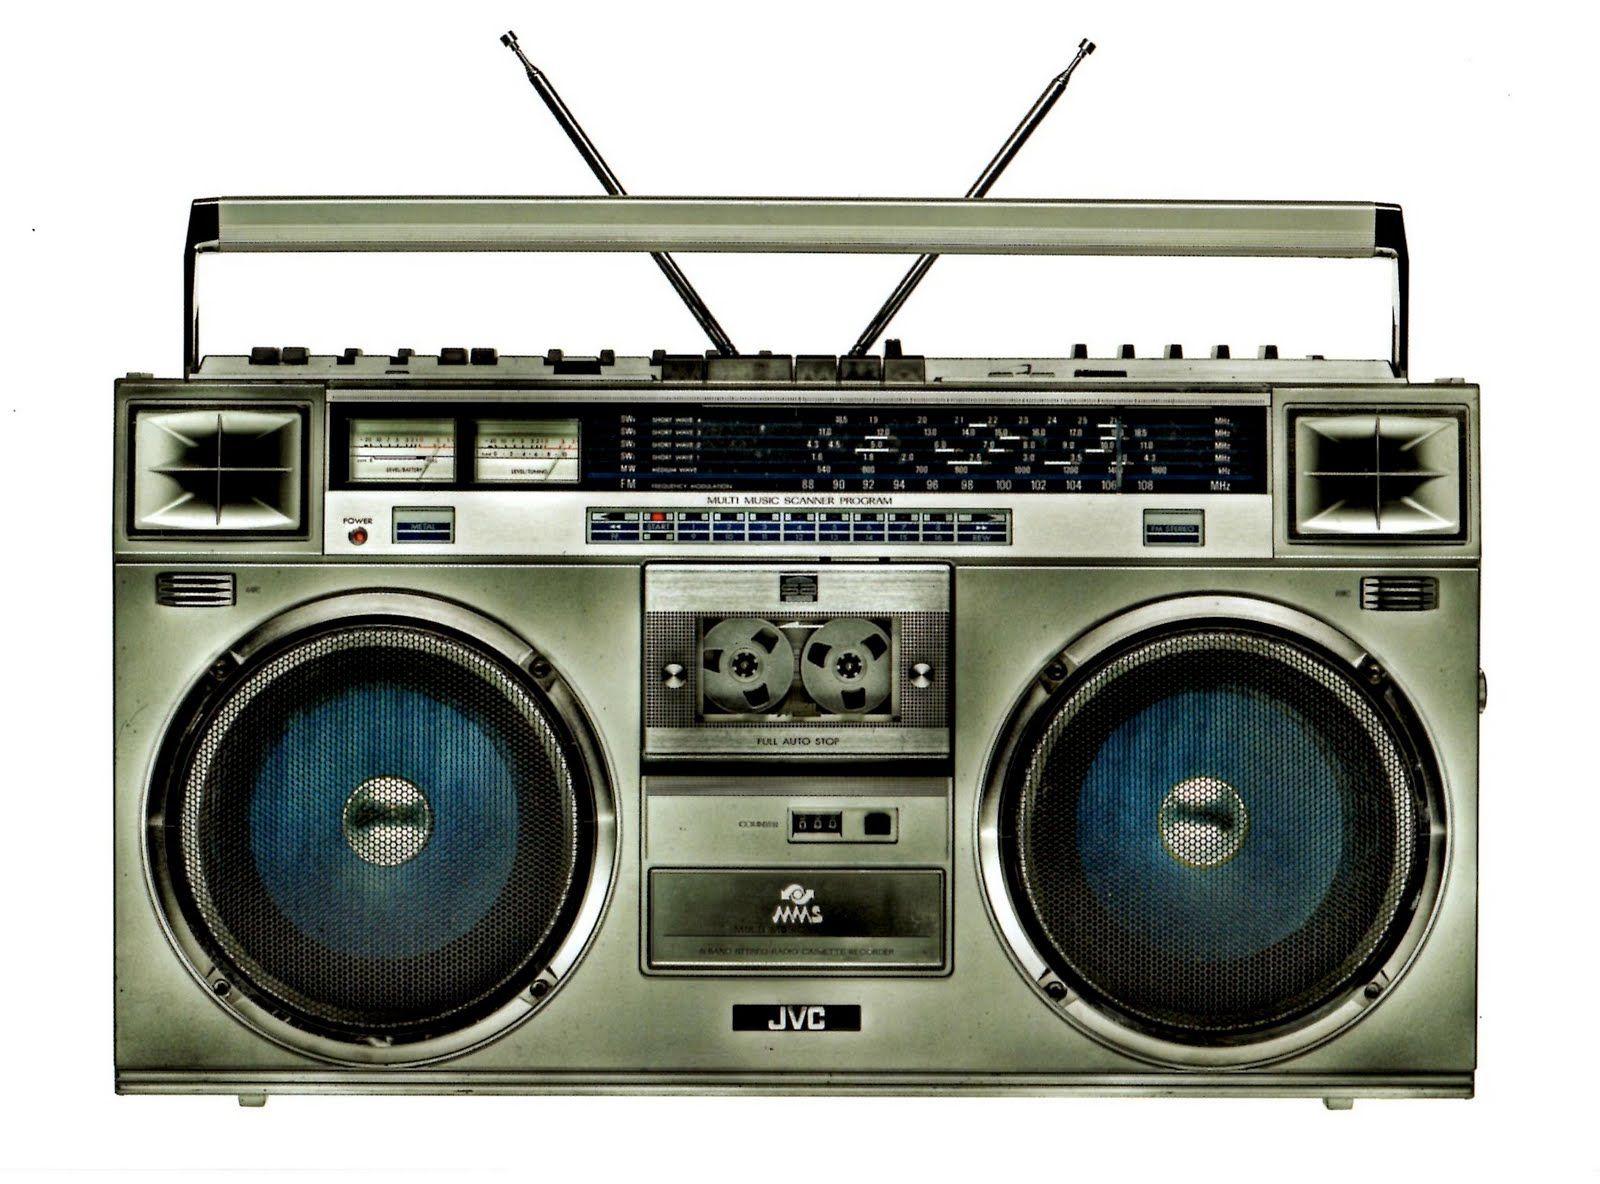 80's clipart tape recorder. Boombox clip art google